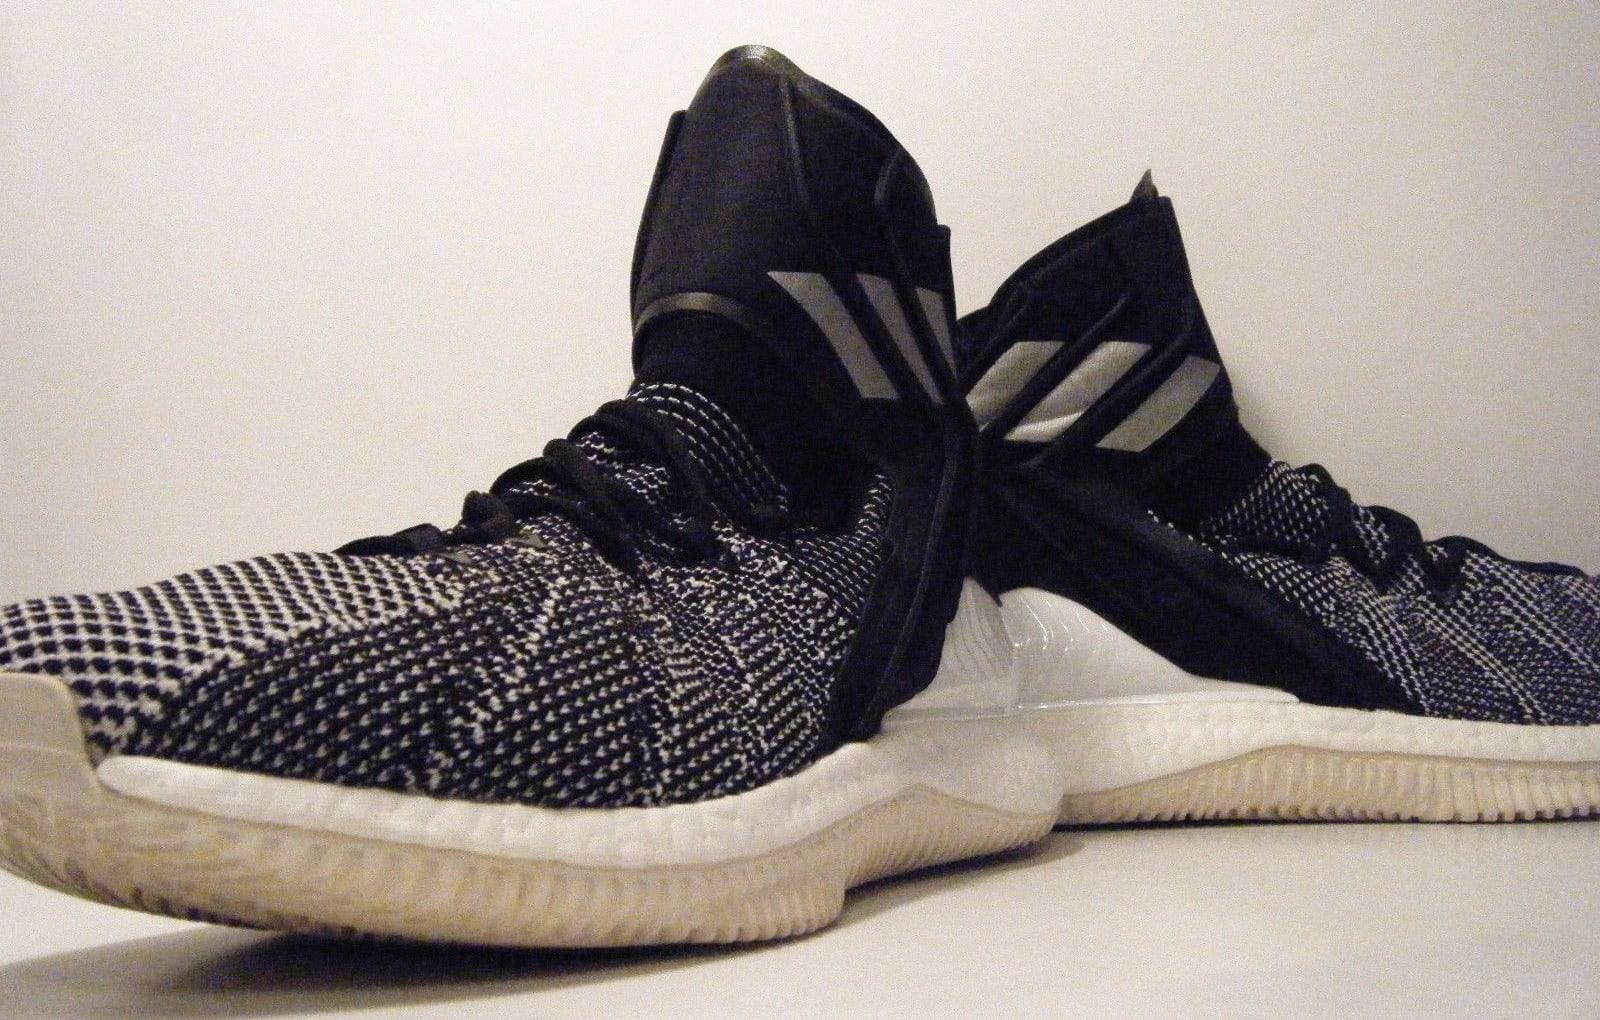 2487021050c Image via eBay Adidas Ultra Boost Basketball Primeknit Prototype PE